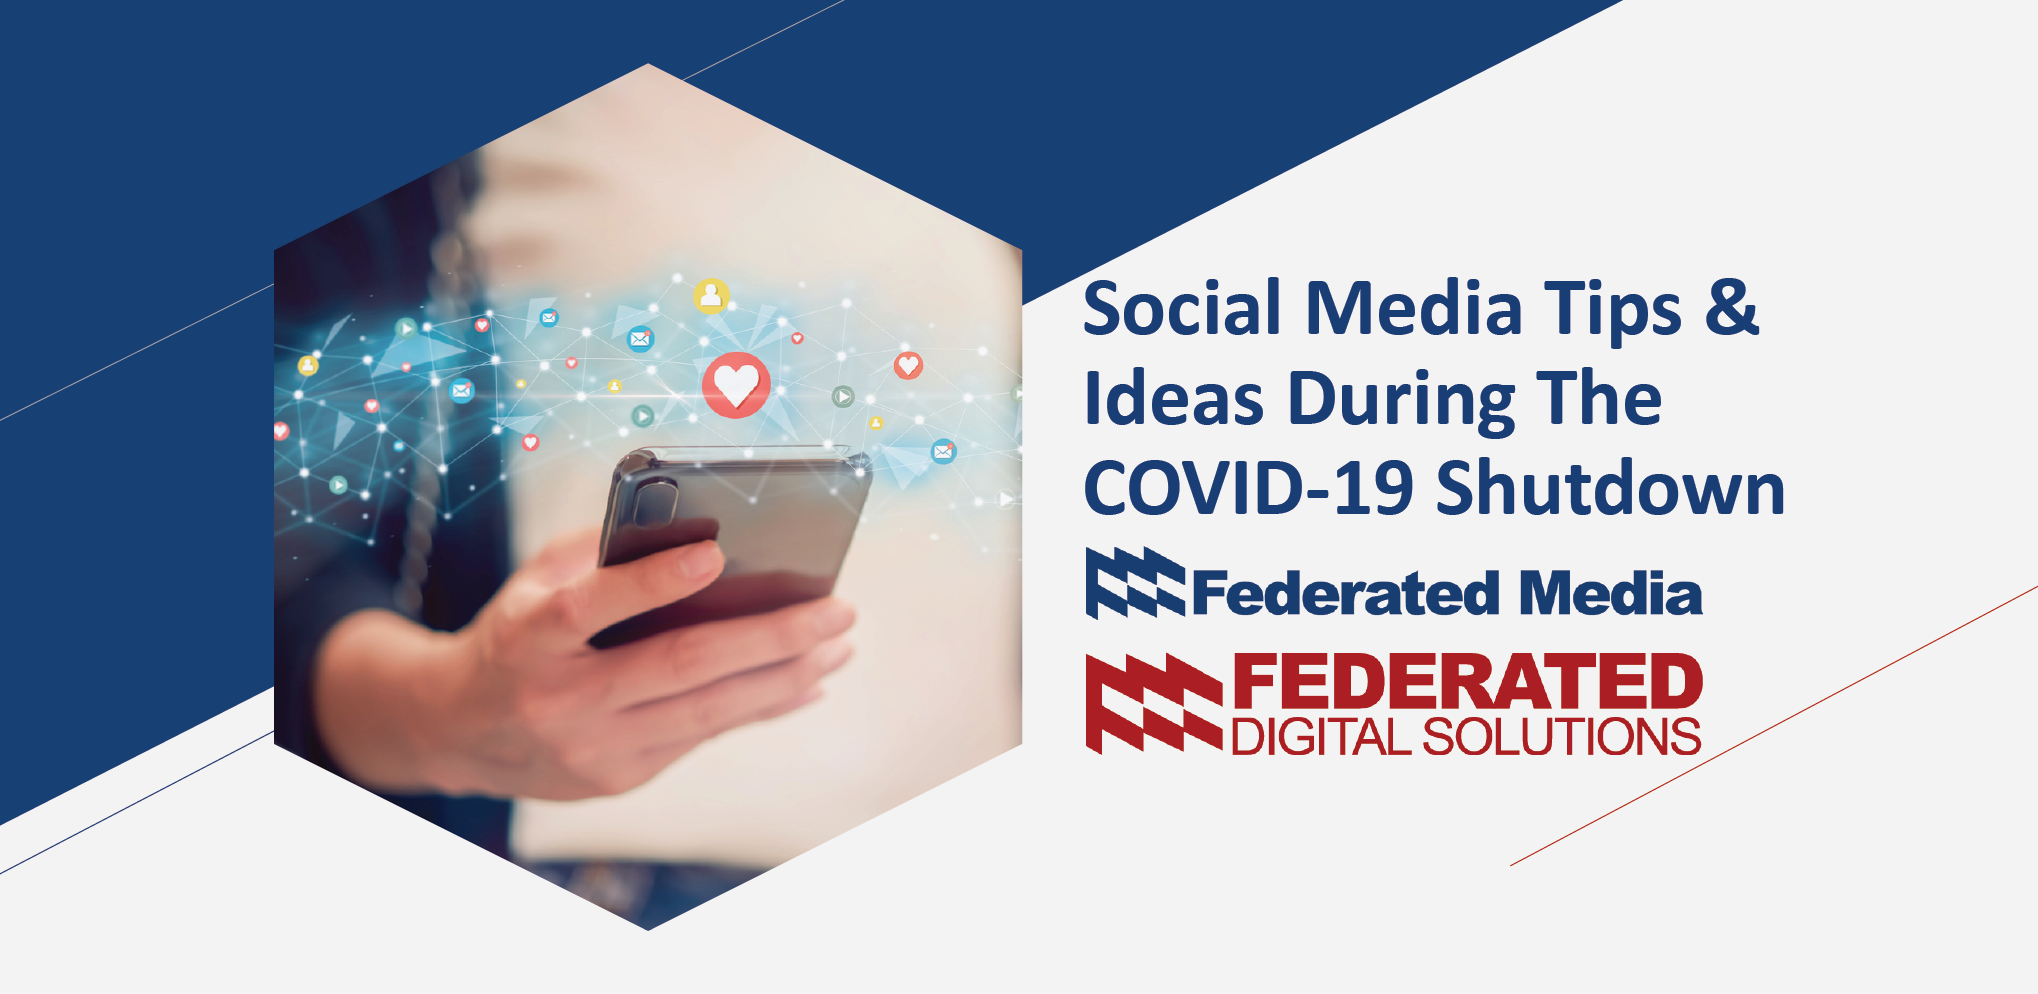 Social Media Tips & Ideas During The COVID-19 Shutdown